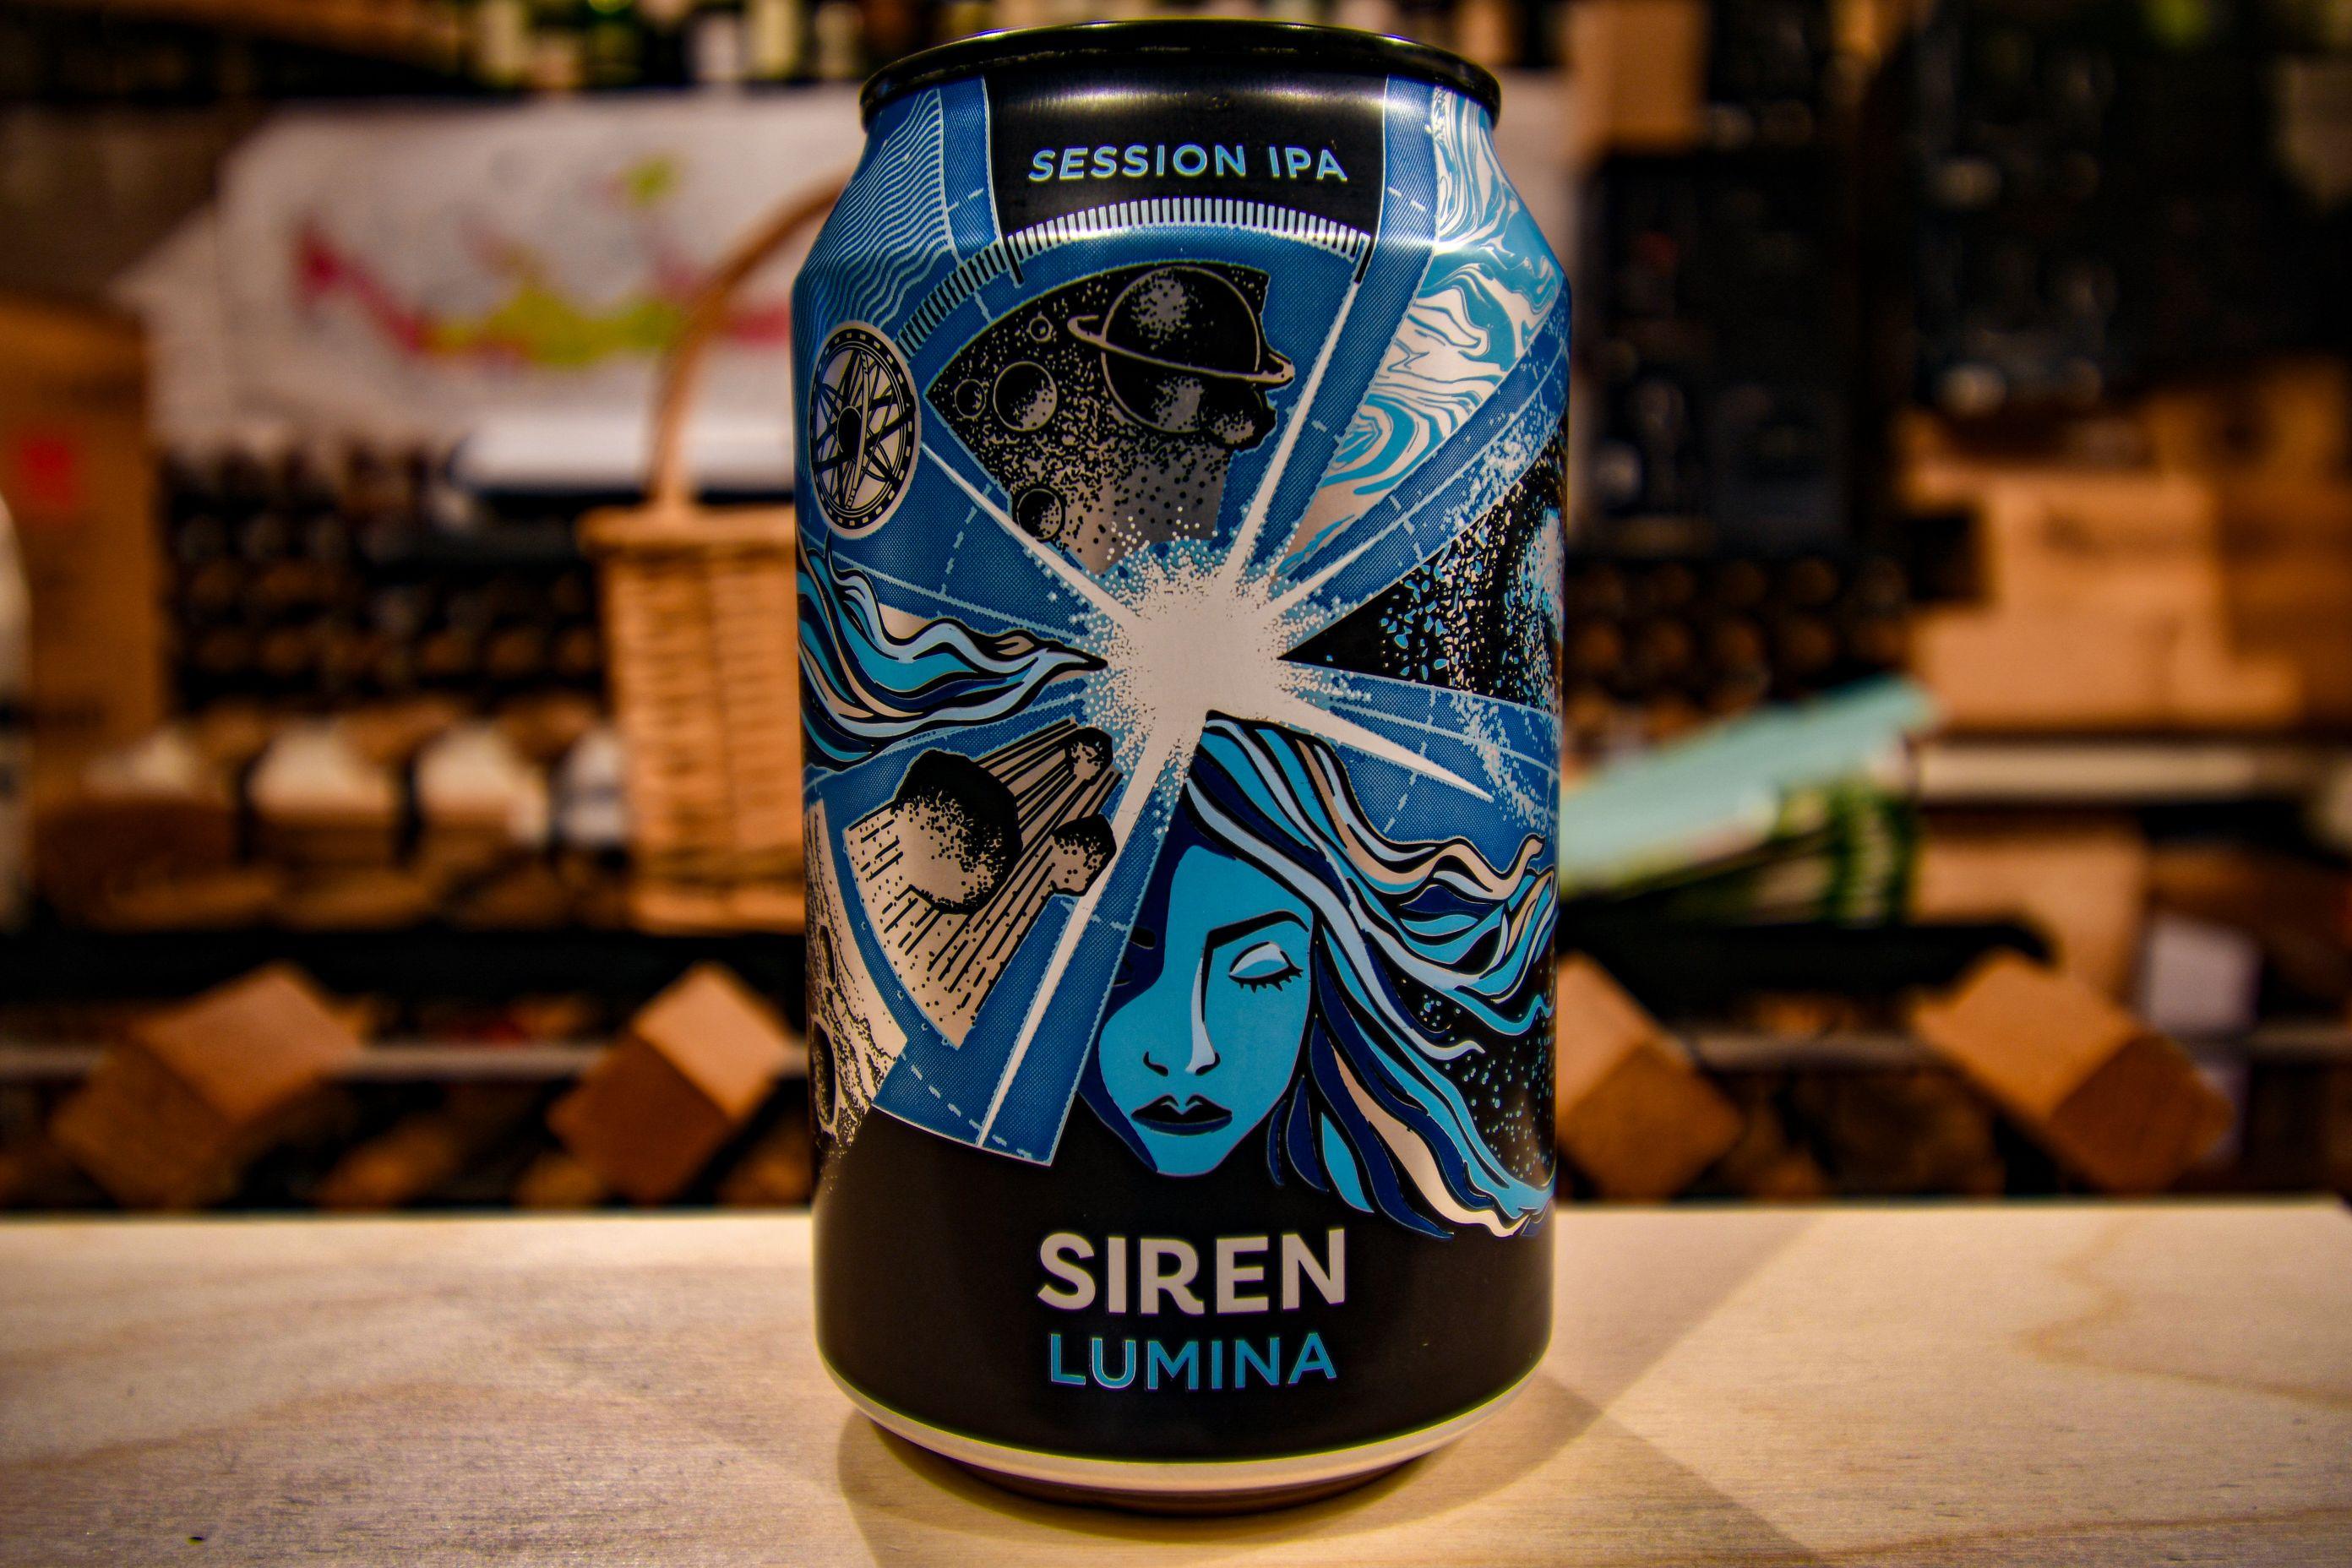 Siren Lumina IPA beer can